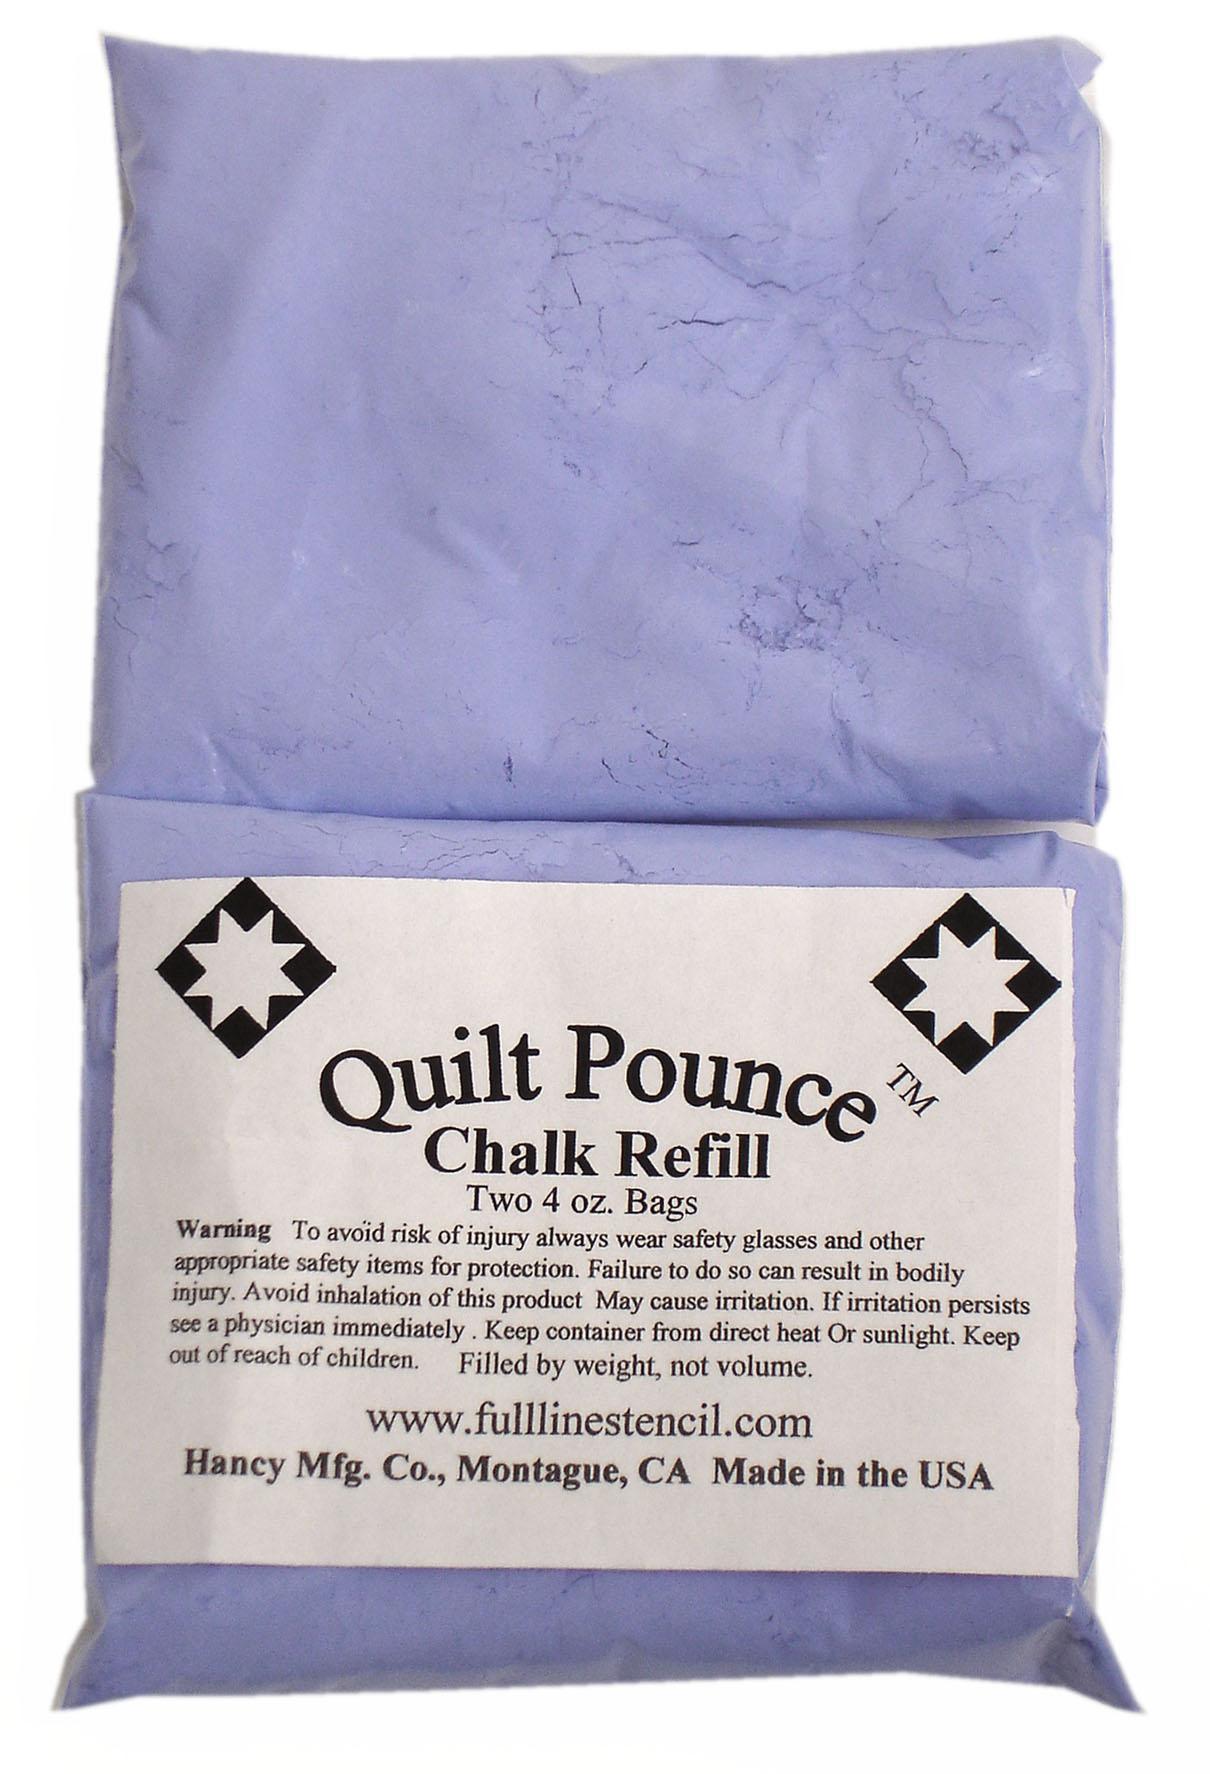 Quilt Pounce Powder Refills